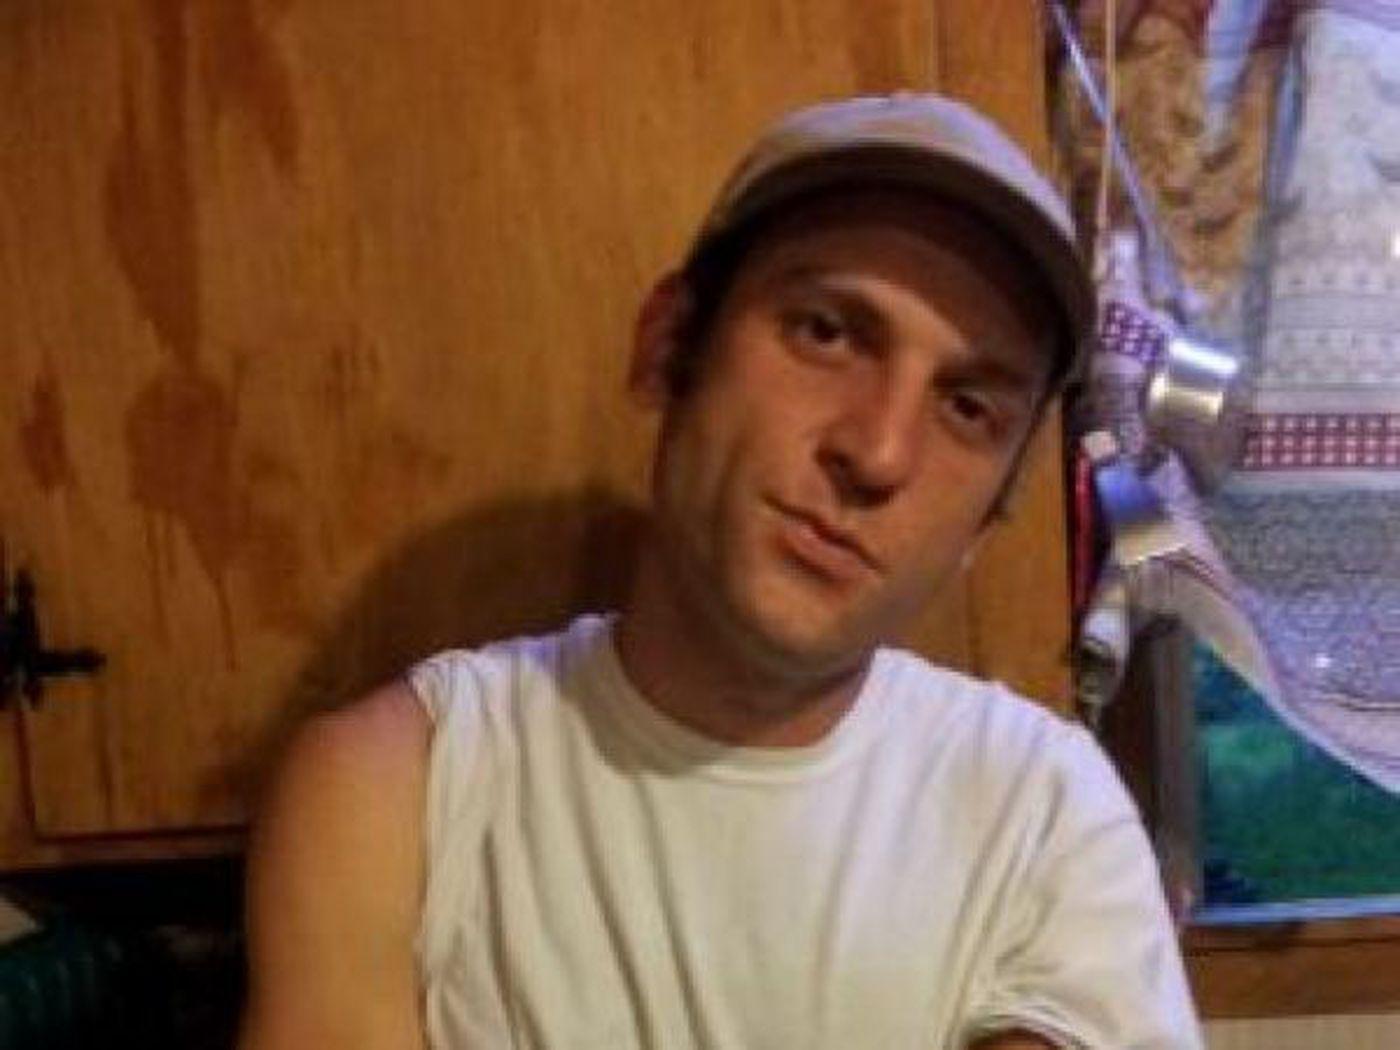 Missing Lamar County man sought